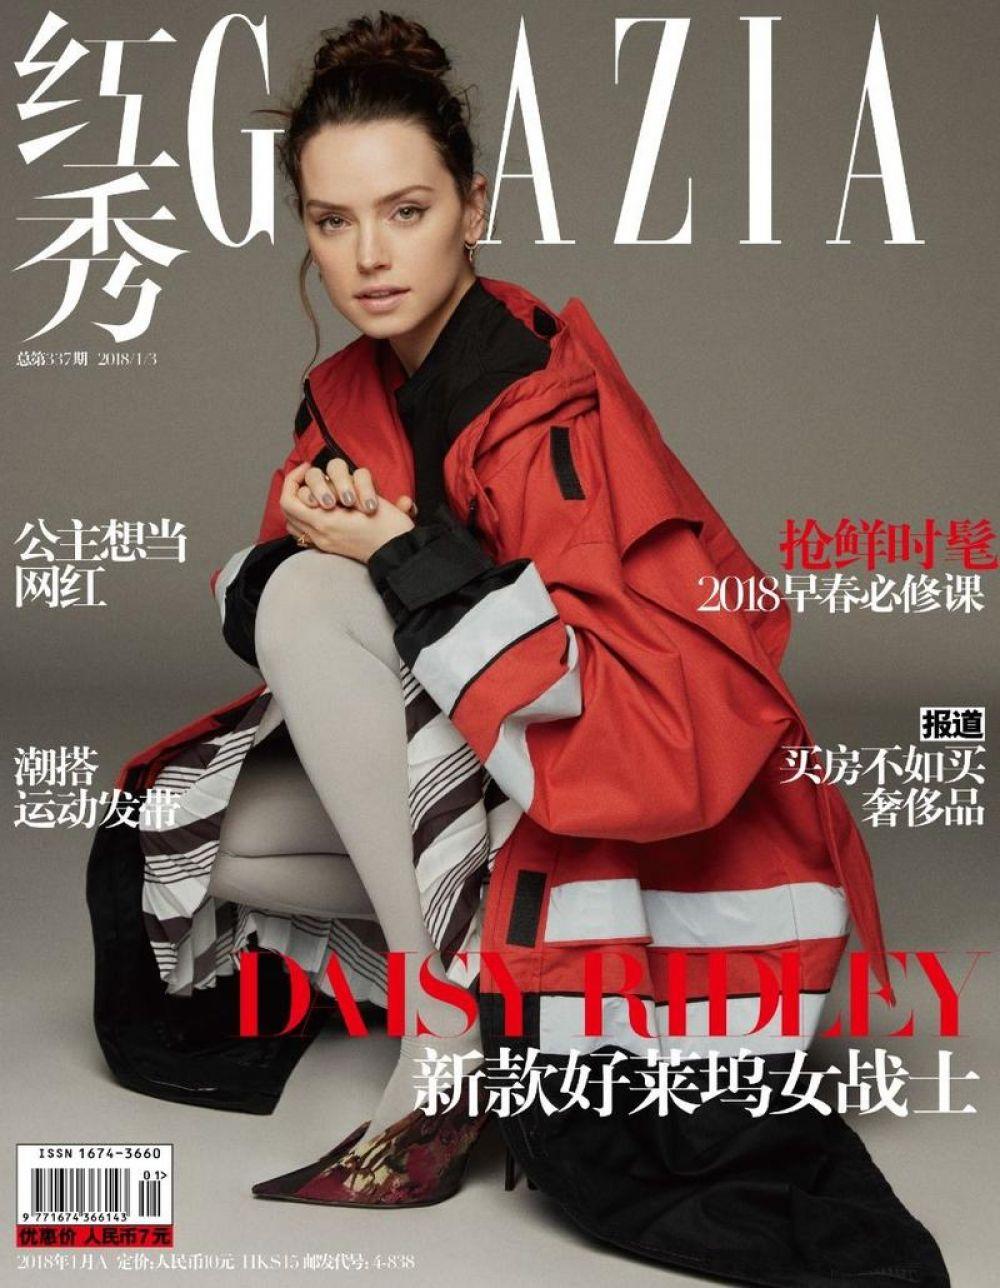 HD Photo Shoot of Daisy Ridley For Grazia Magazine China January 2018 Issue